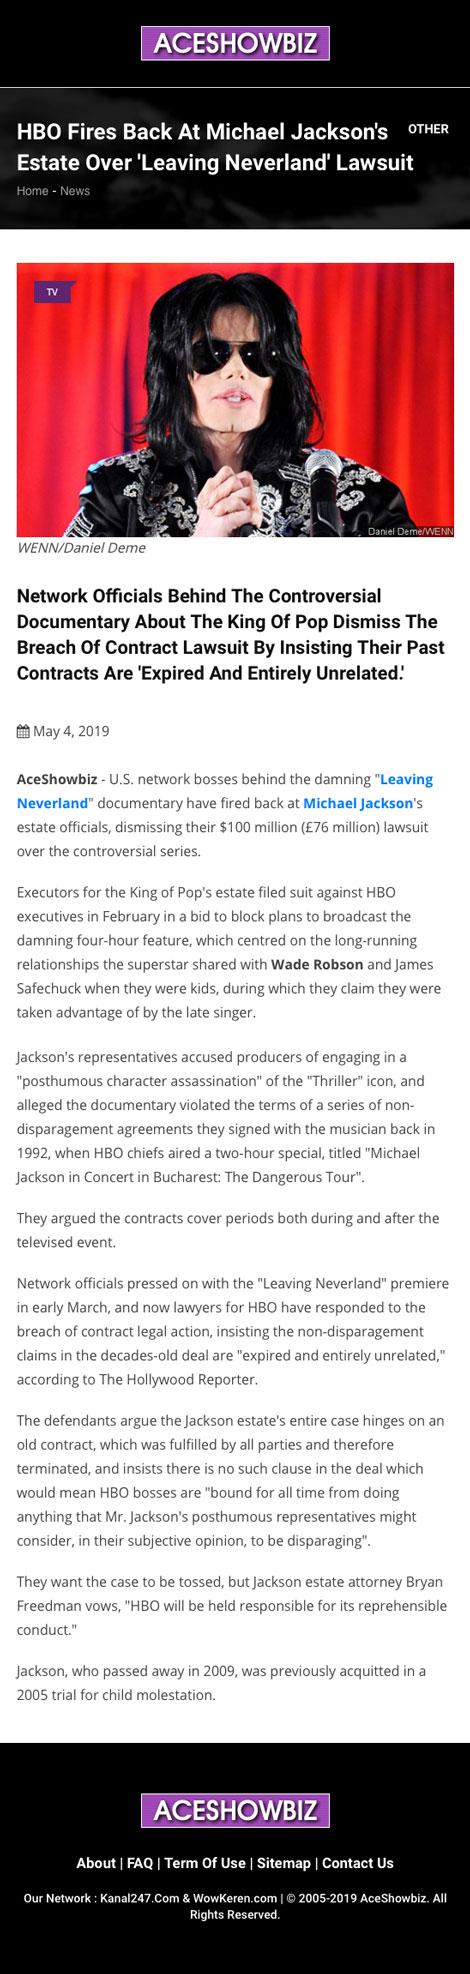 HBO Fires Back At Michael Jackson's Estate Over 'Leaving Neverland' Lawsuit - article by AceShowBiz.com